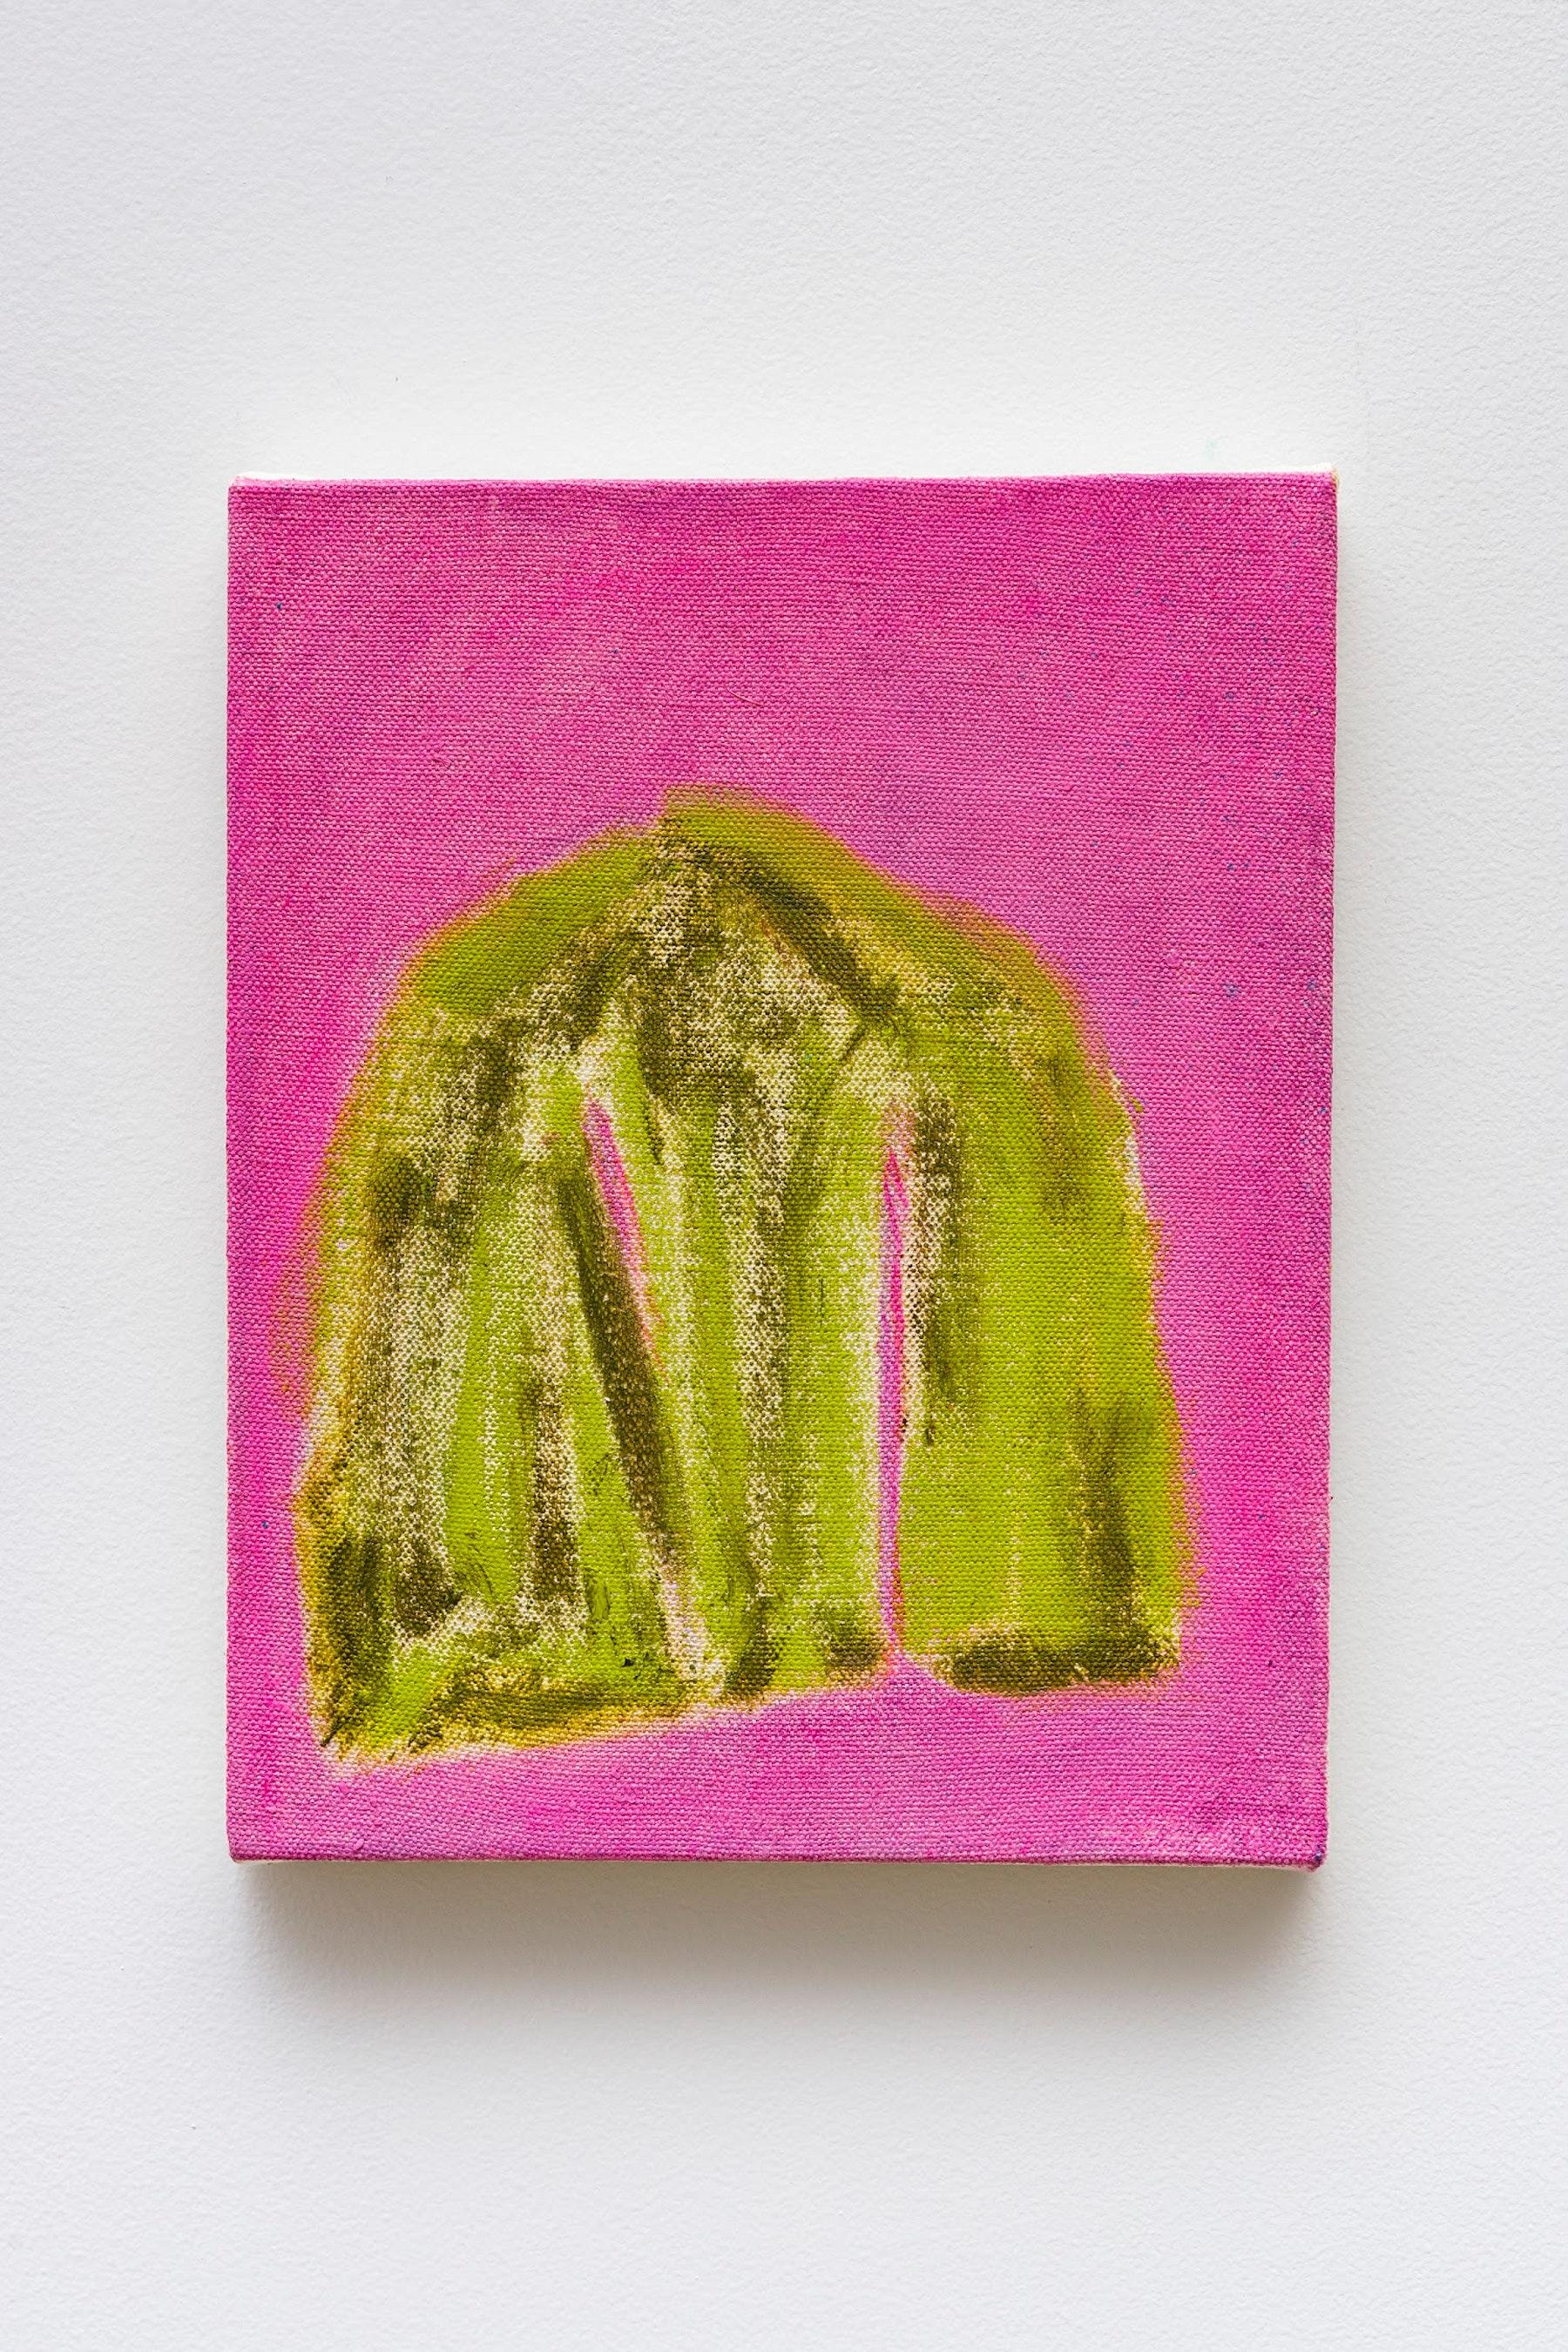 "Monique Van Genderen ""Untitled,"" 2020 Oil on canvas 10 x 8"" [HxW] (25.4 x 20.32 cm) Inventory #VGE395 Courtesy of the artist and Vielmetter Los Angeles Photo credit: Jeff Mclane"